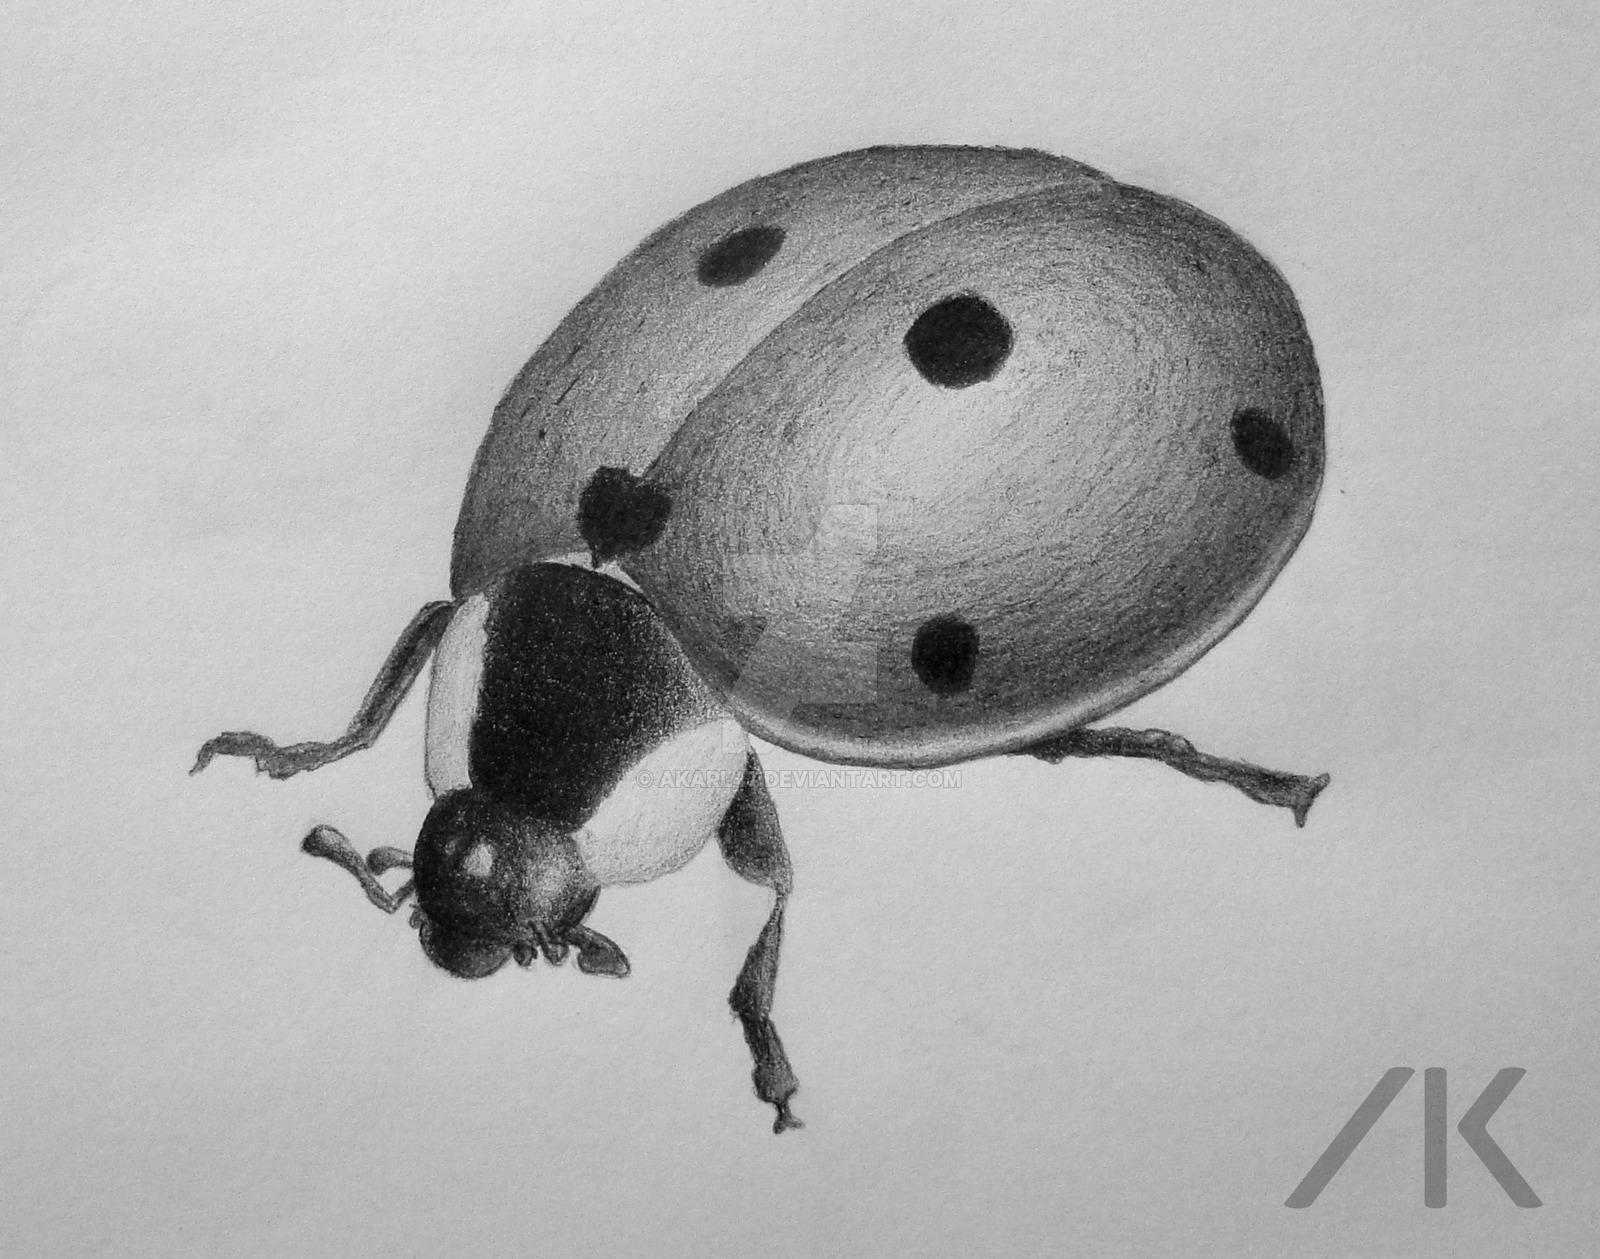 Drawn insect realistic Pencil Ladybug pencil Ladybug AKarl47